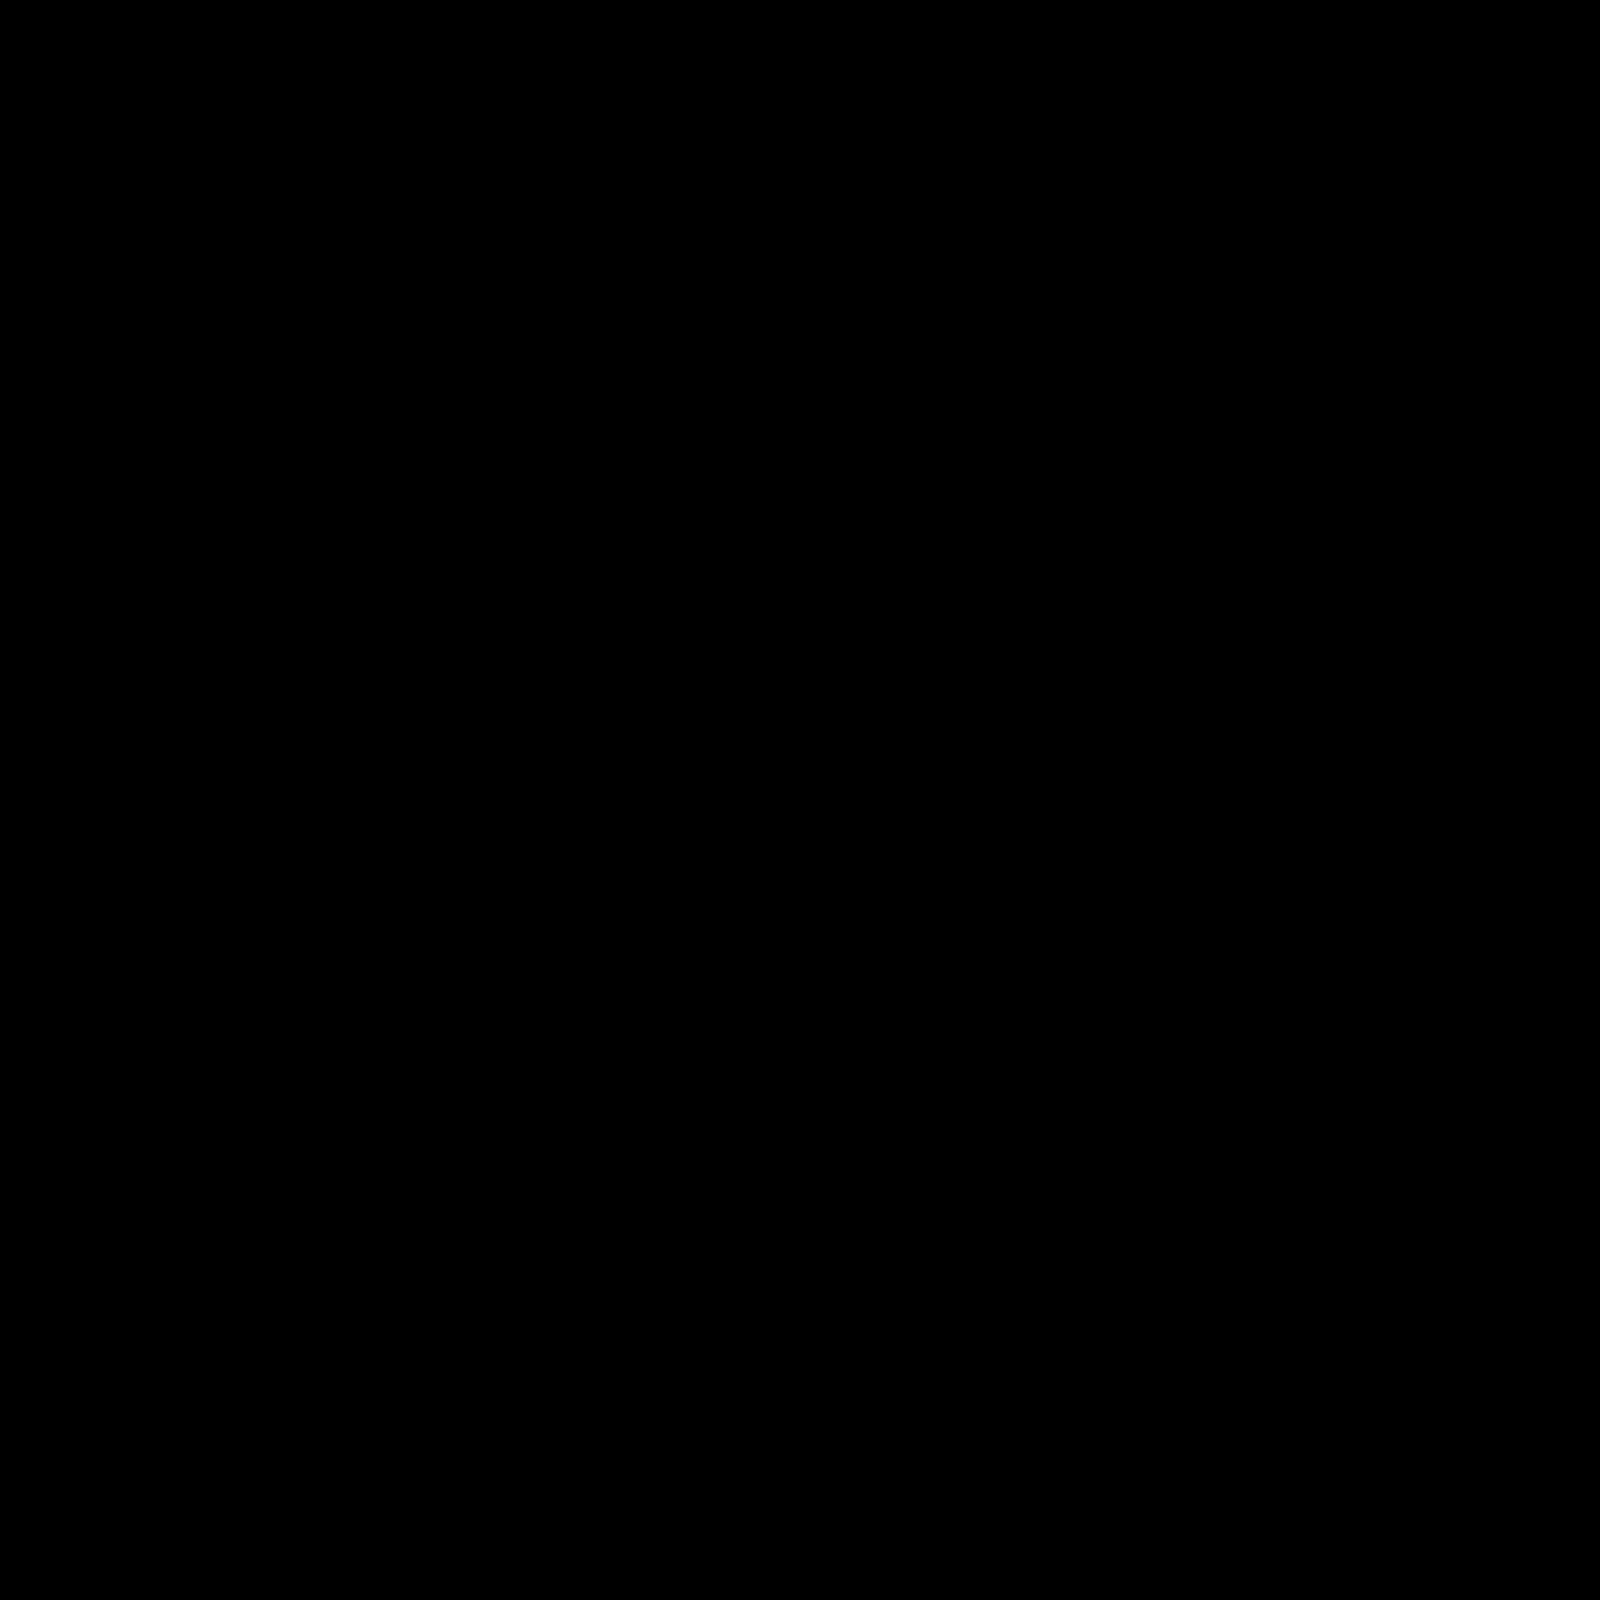 Dolcaina Filled icon